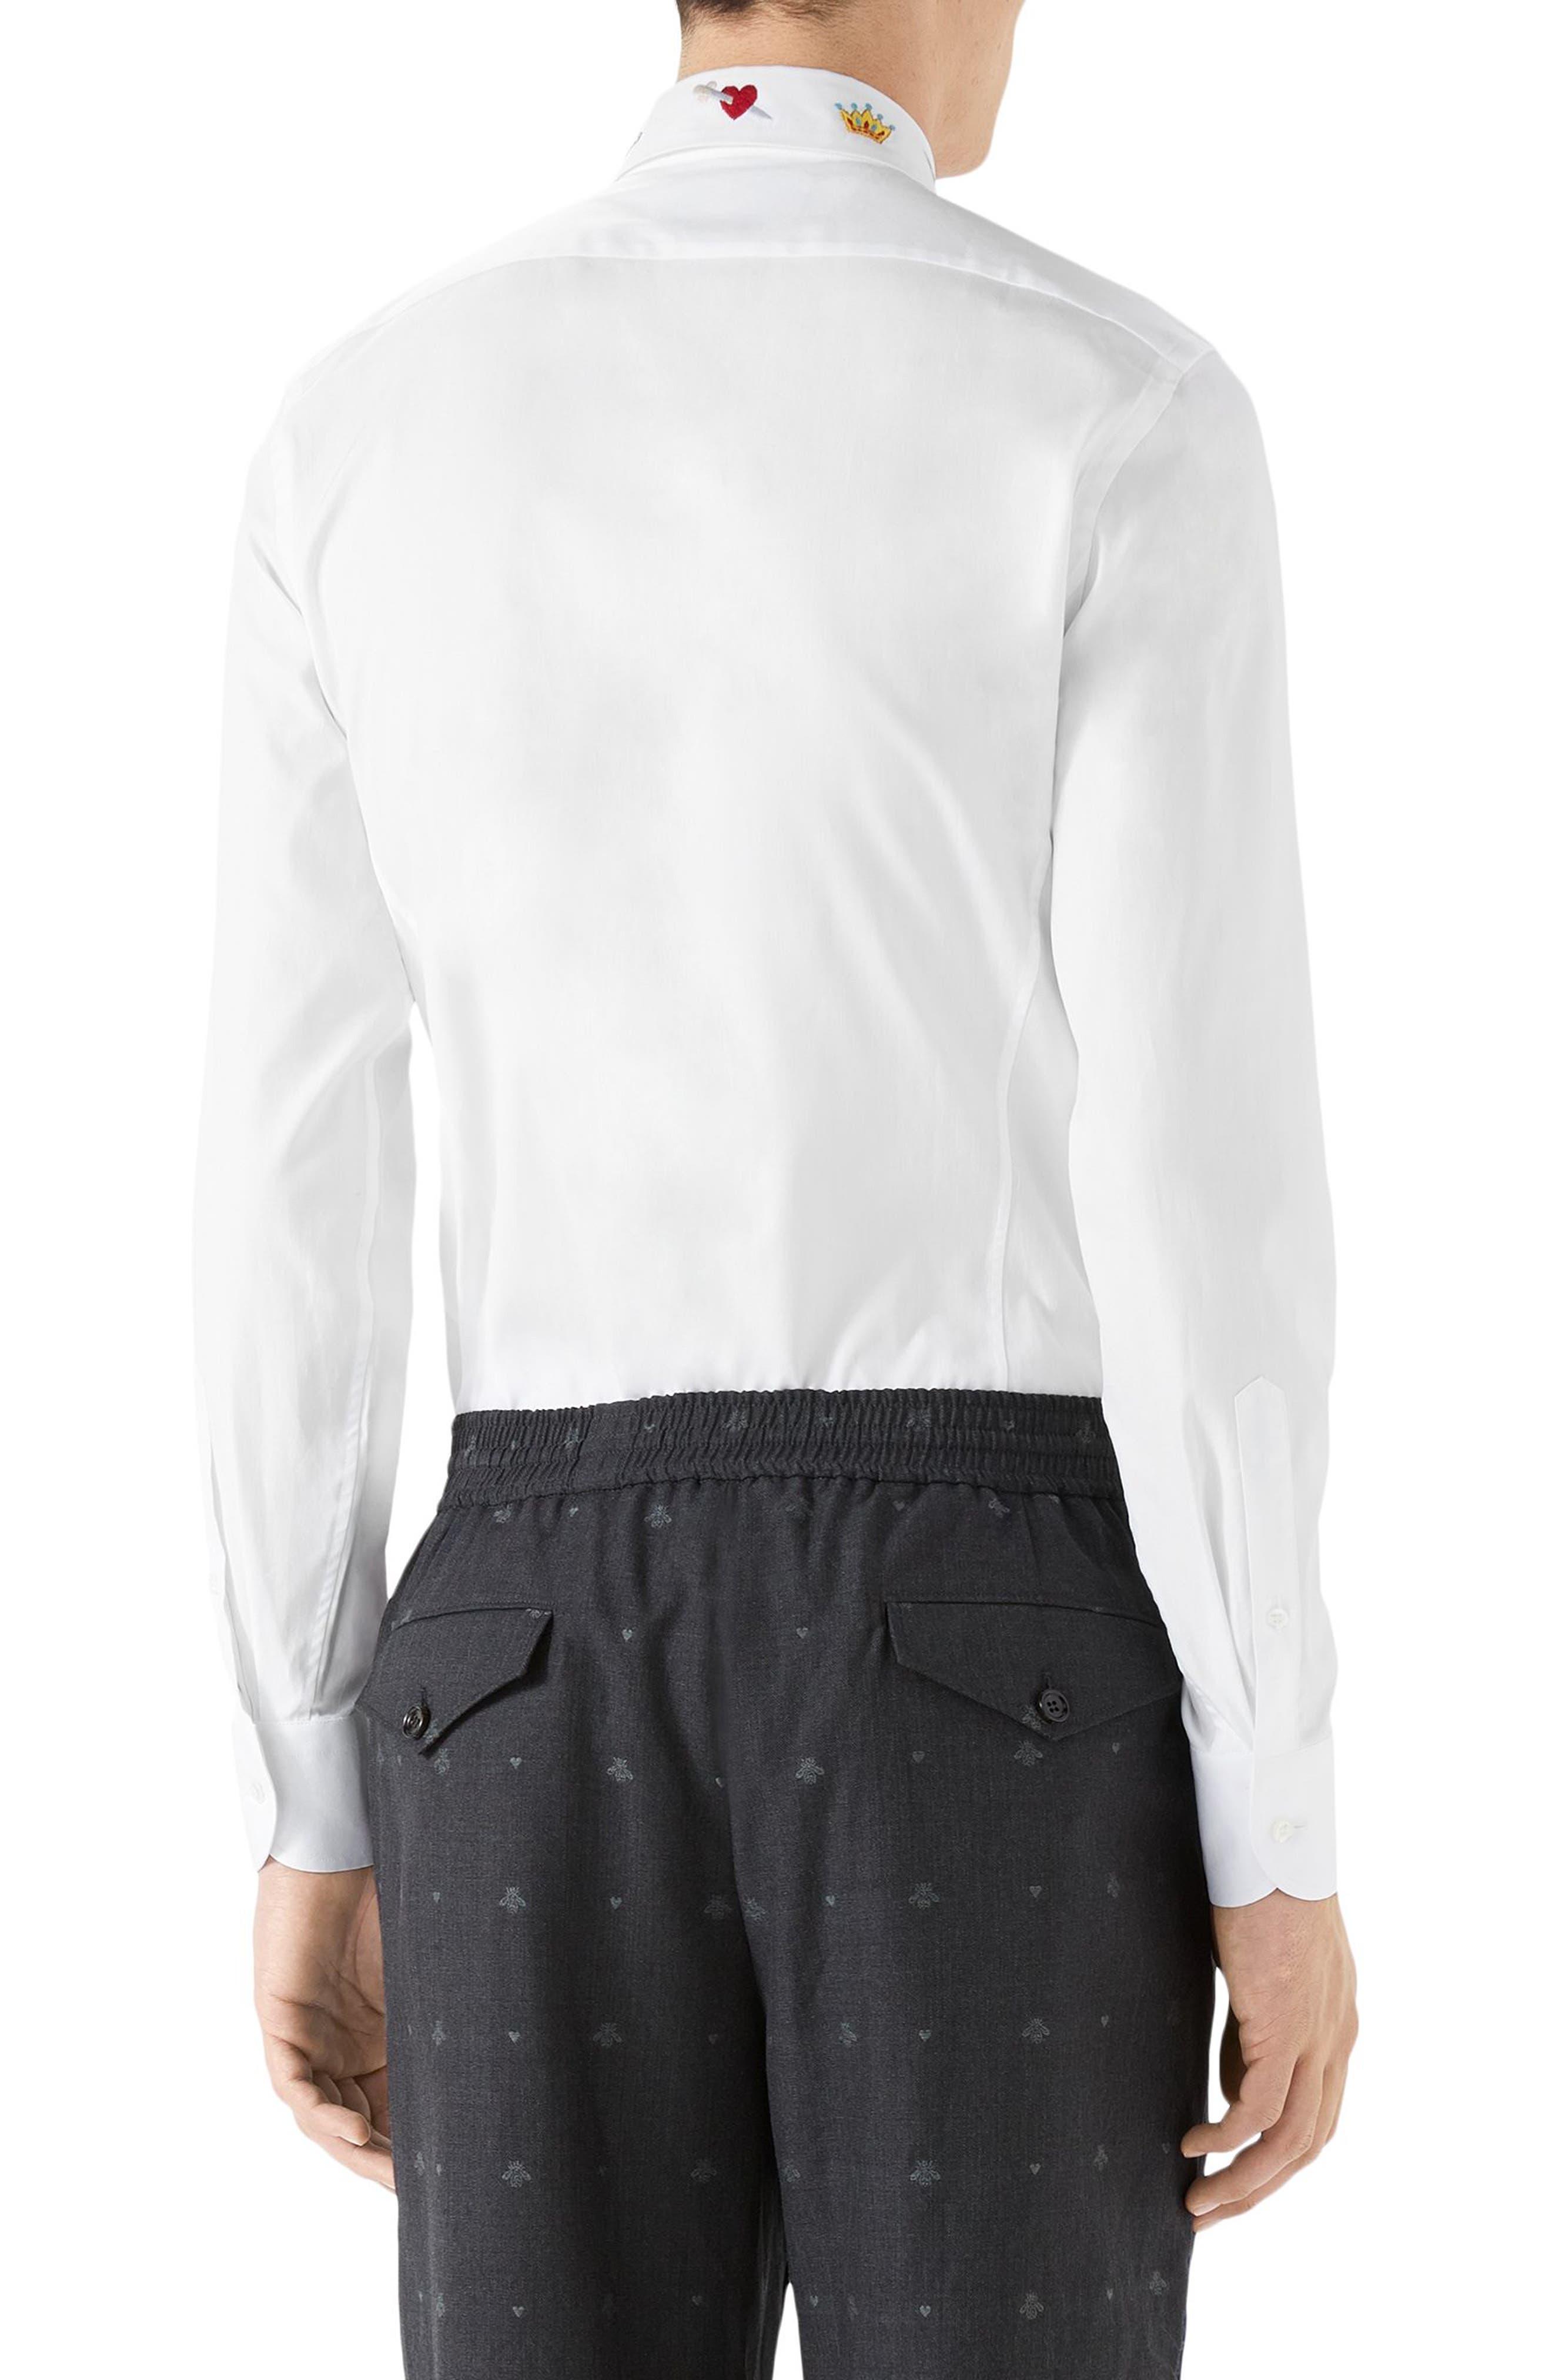 Embroidered Collar Emblem Sport Shirt,                             Alternate thumbnail 2, color,                             WHITE